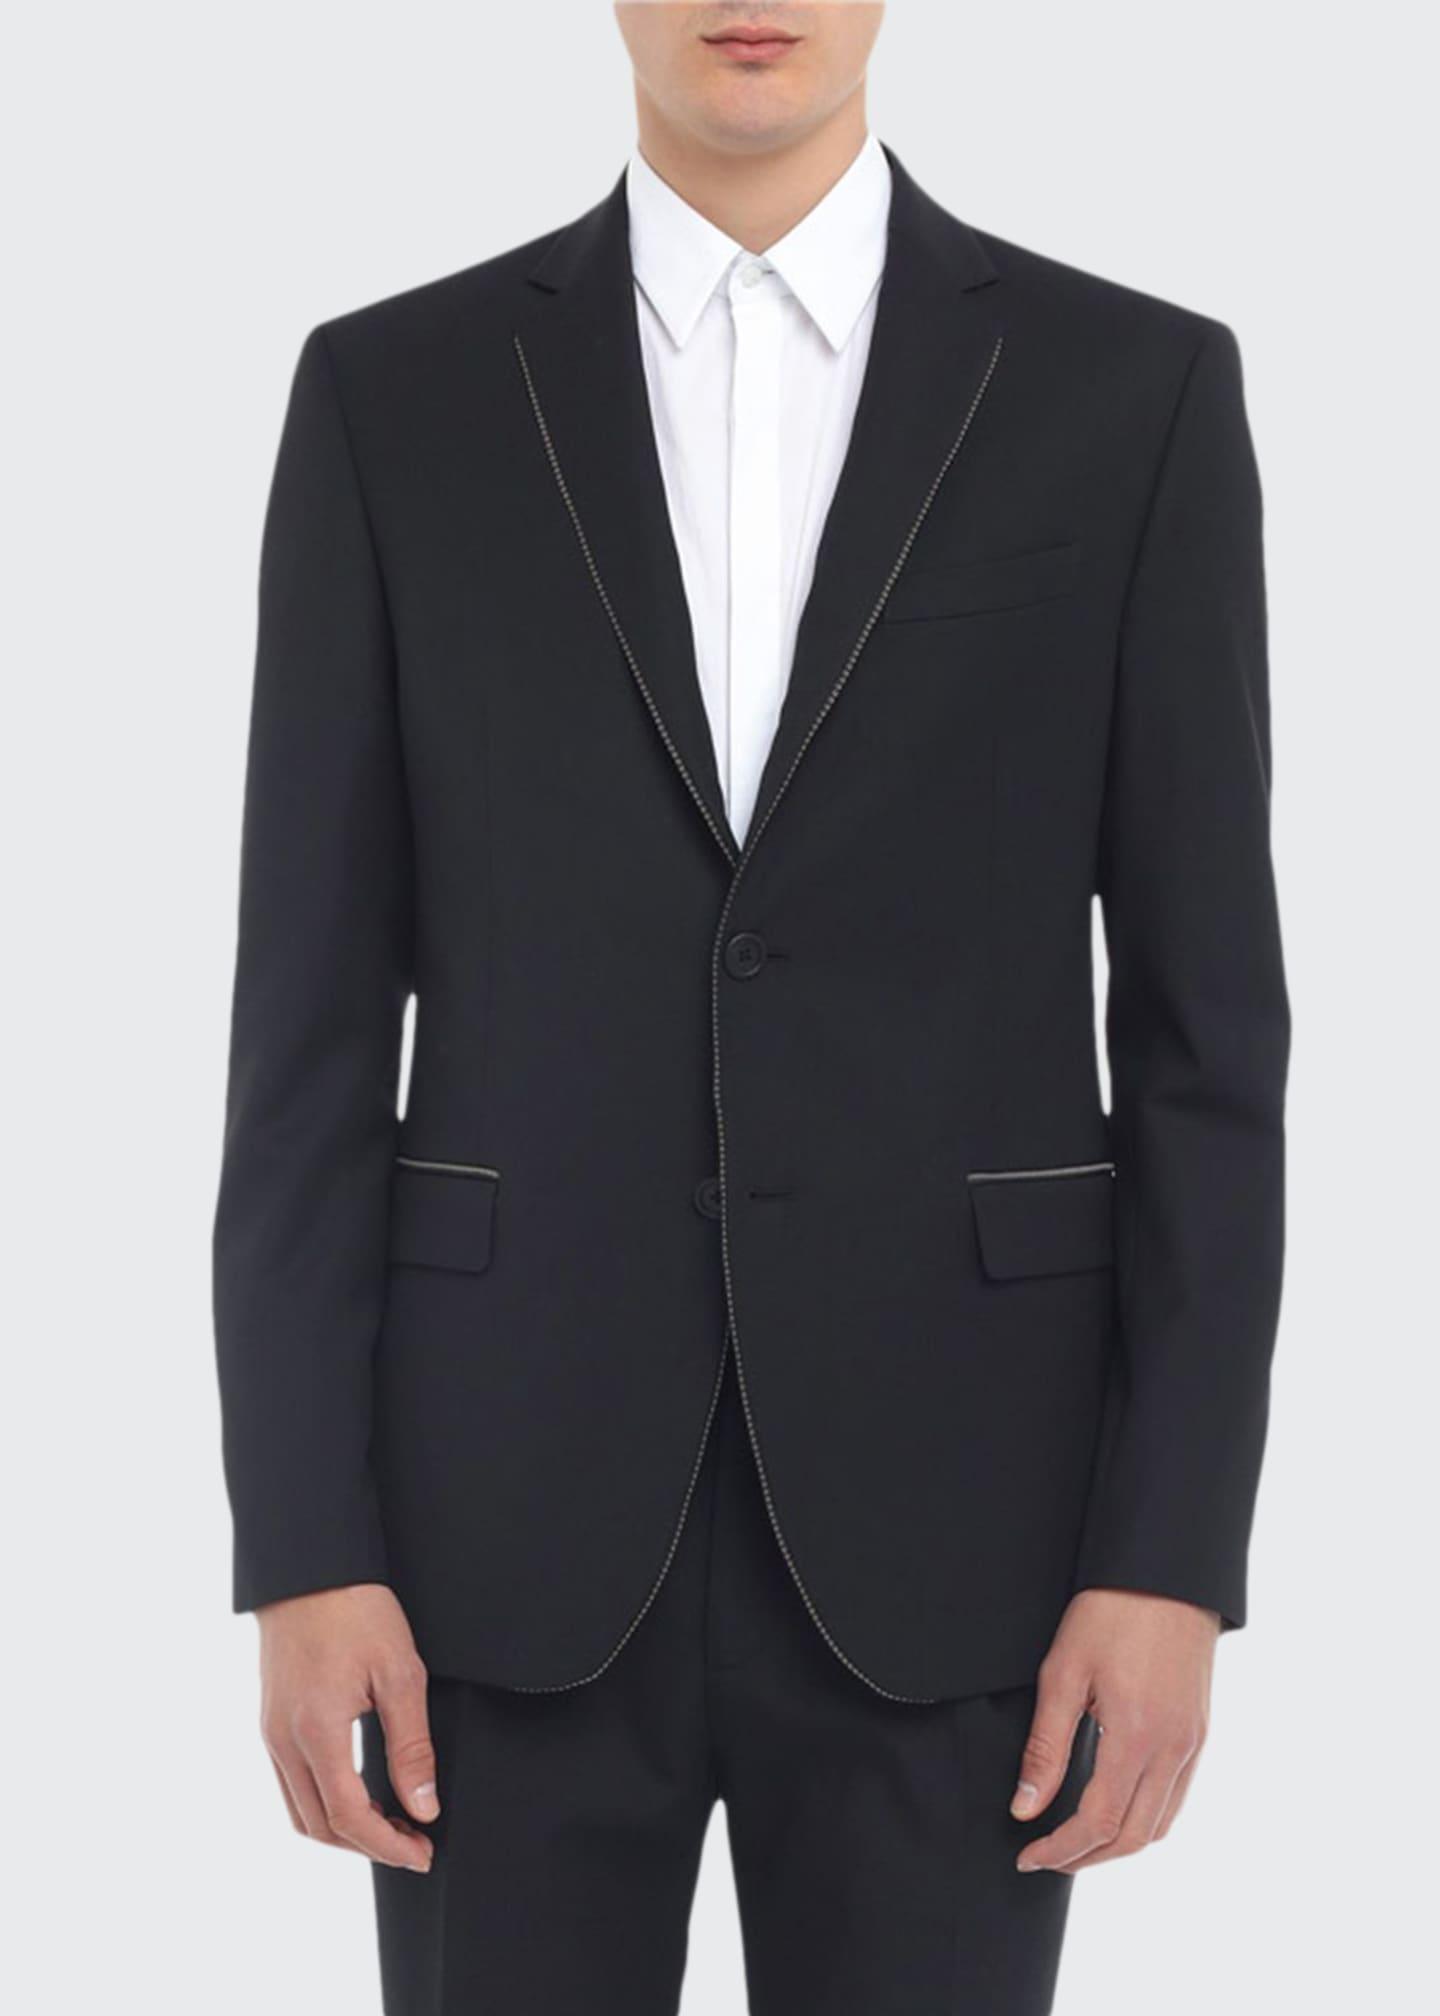 Fendi Men's Multi-Piping Two-Button Jacket